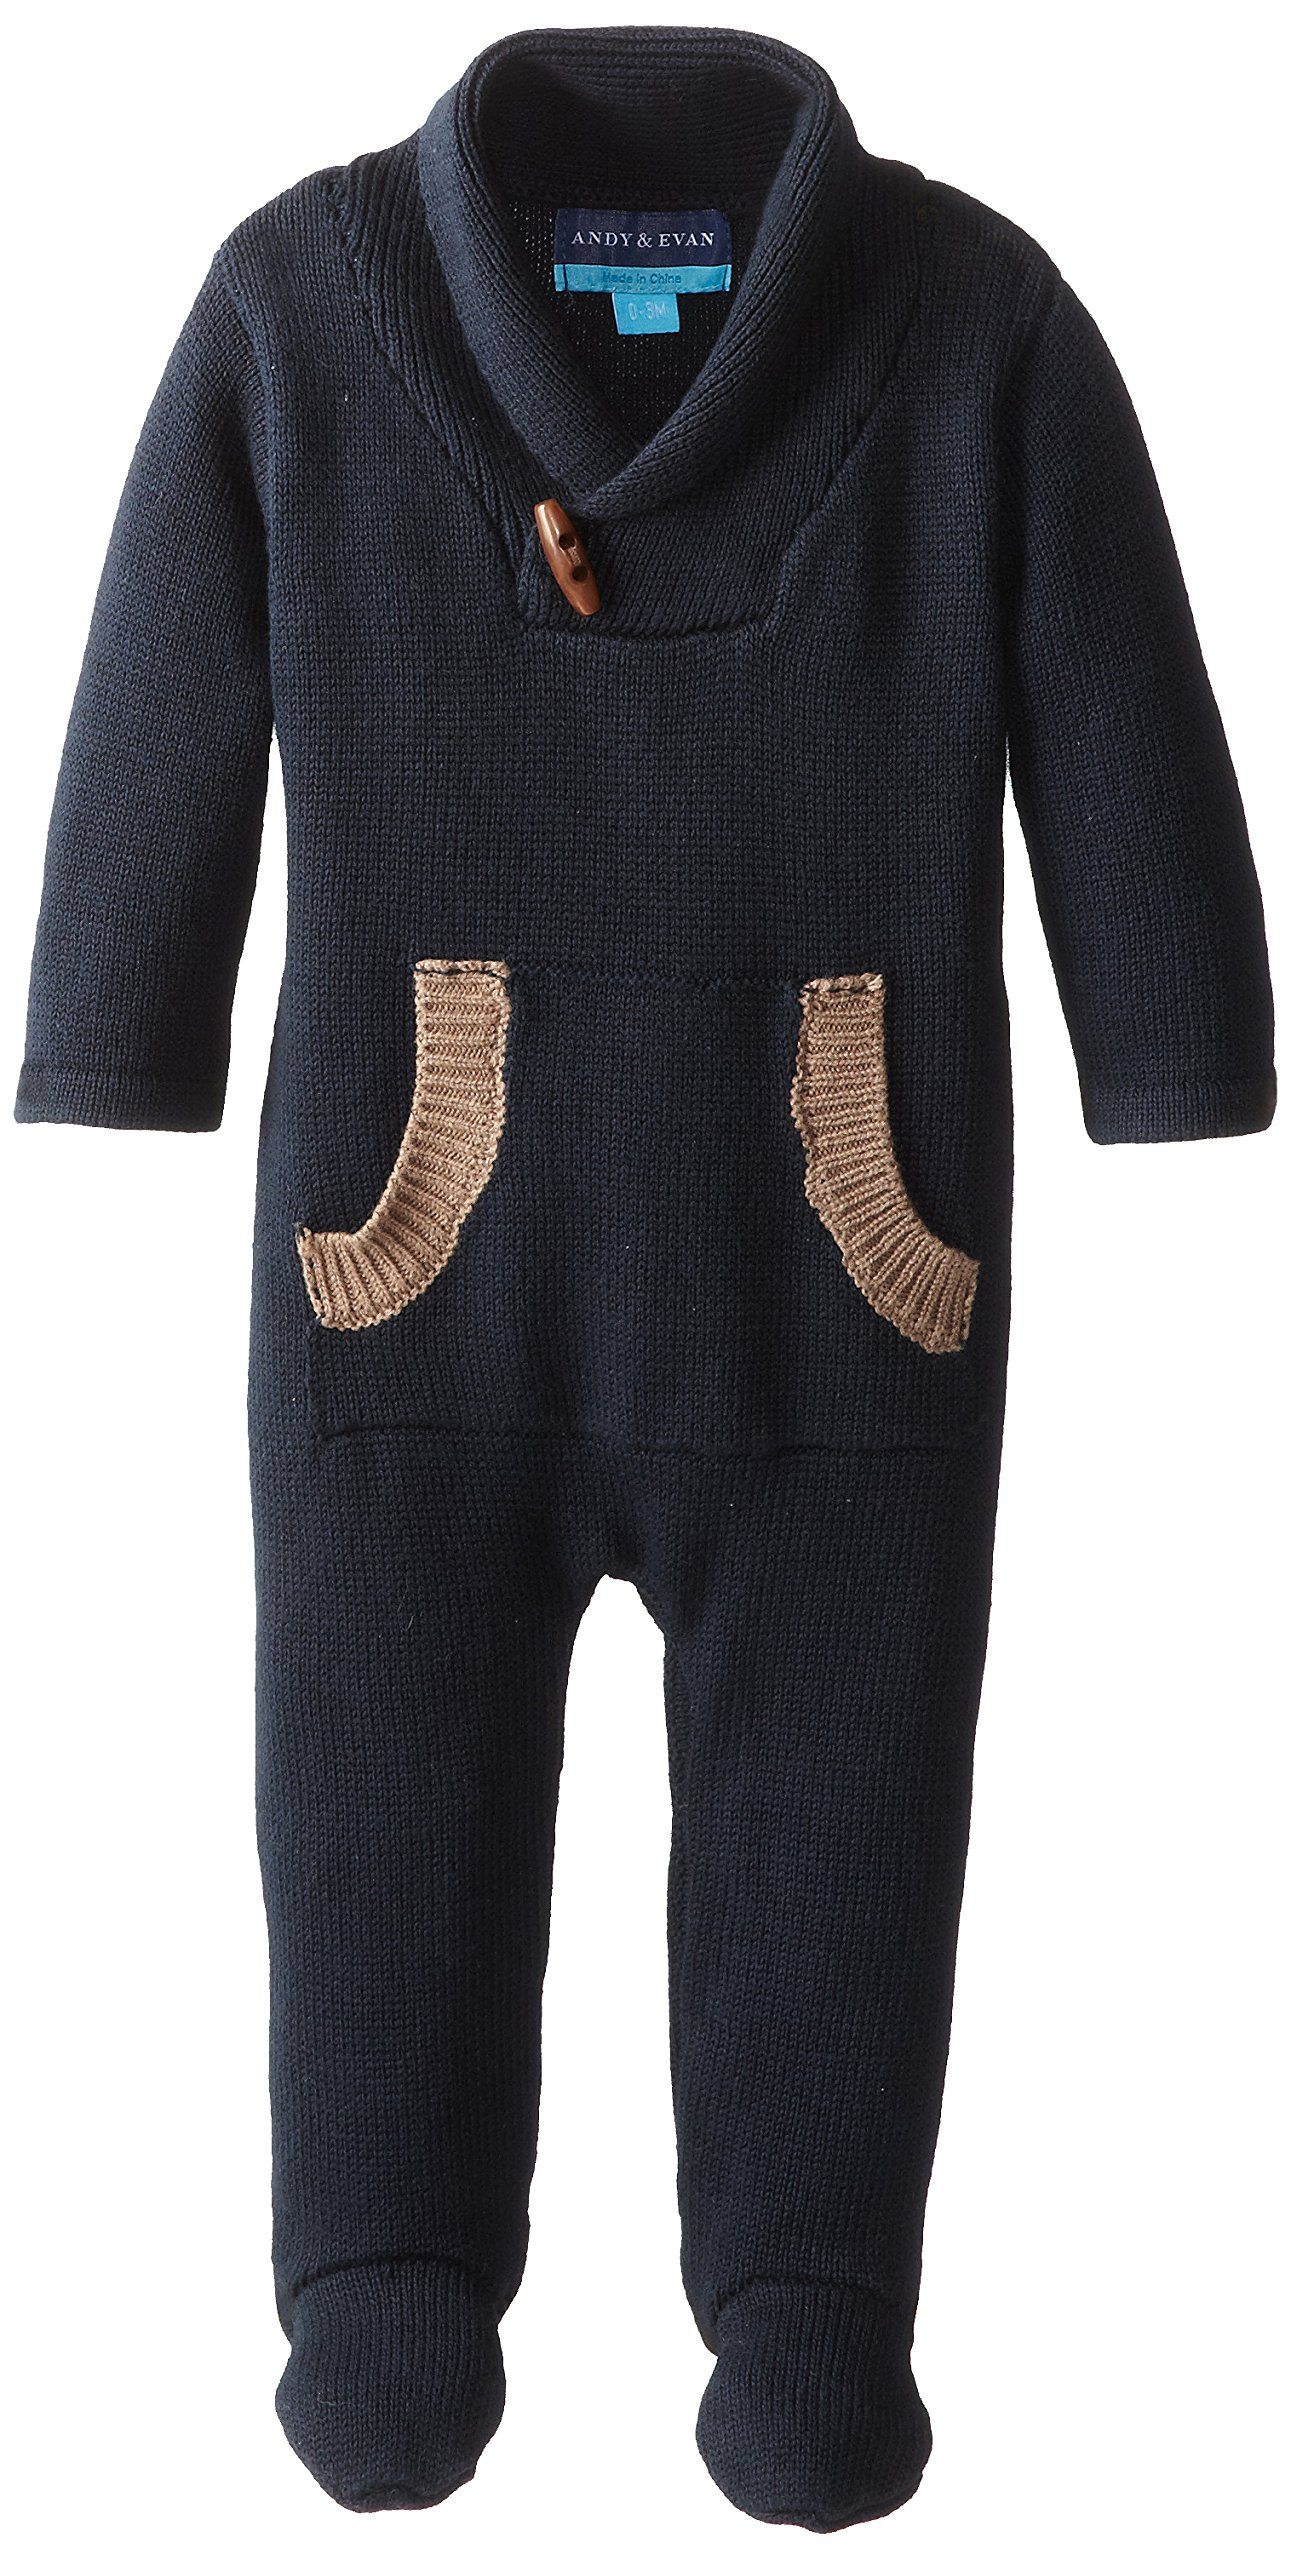 02b3a3f3cfcc Amazon.com  Andy   Evan Baby-Boys Newborn Navy Sweater Romper